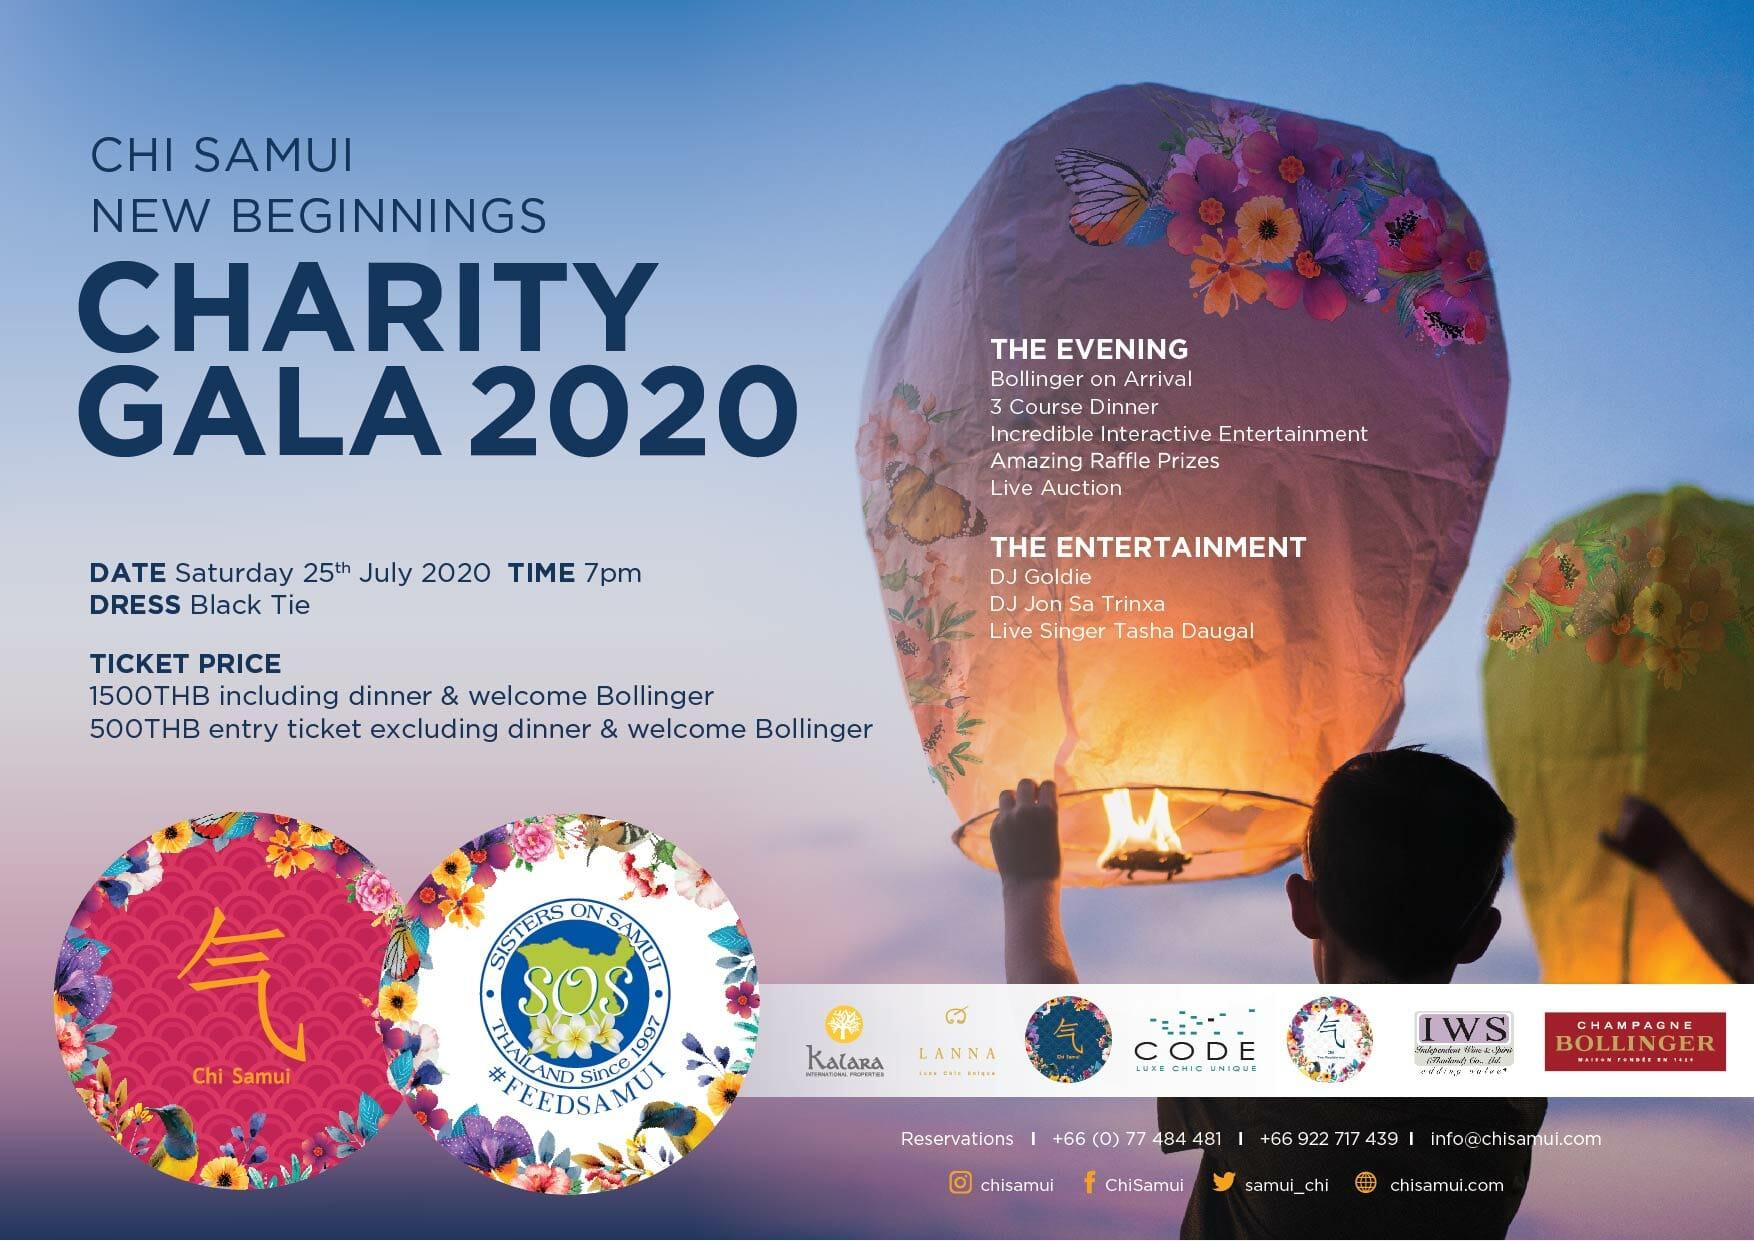 Chi Samui Charity Gala 2020